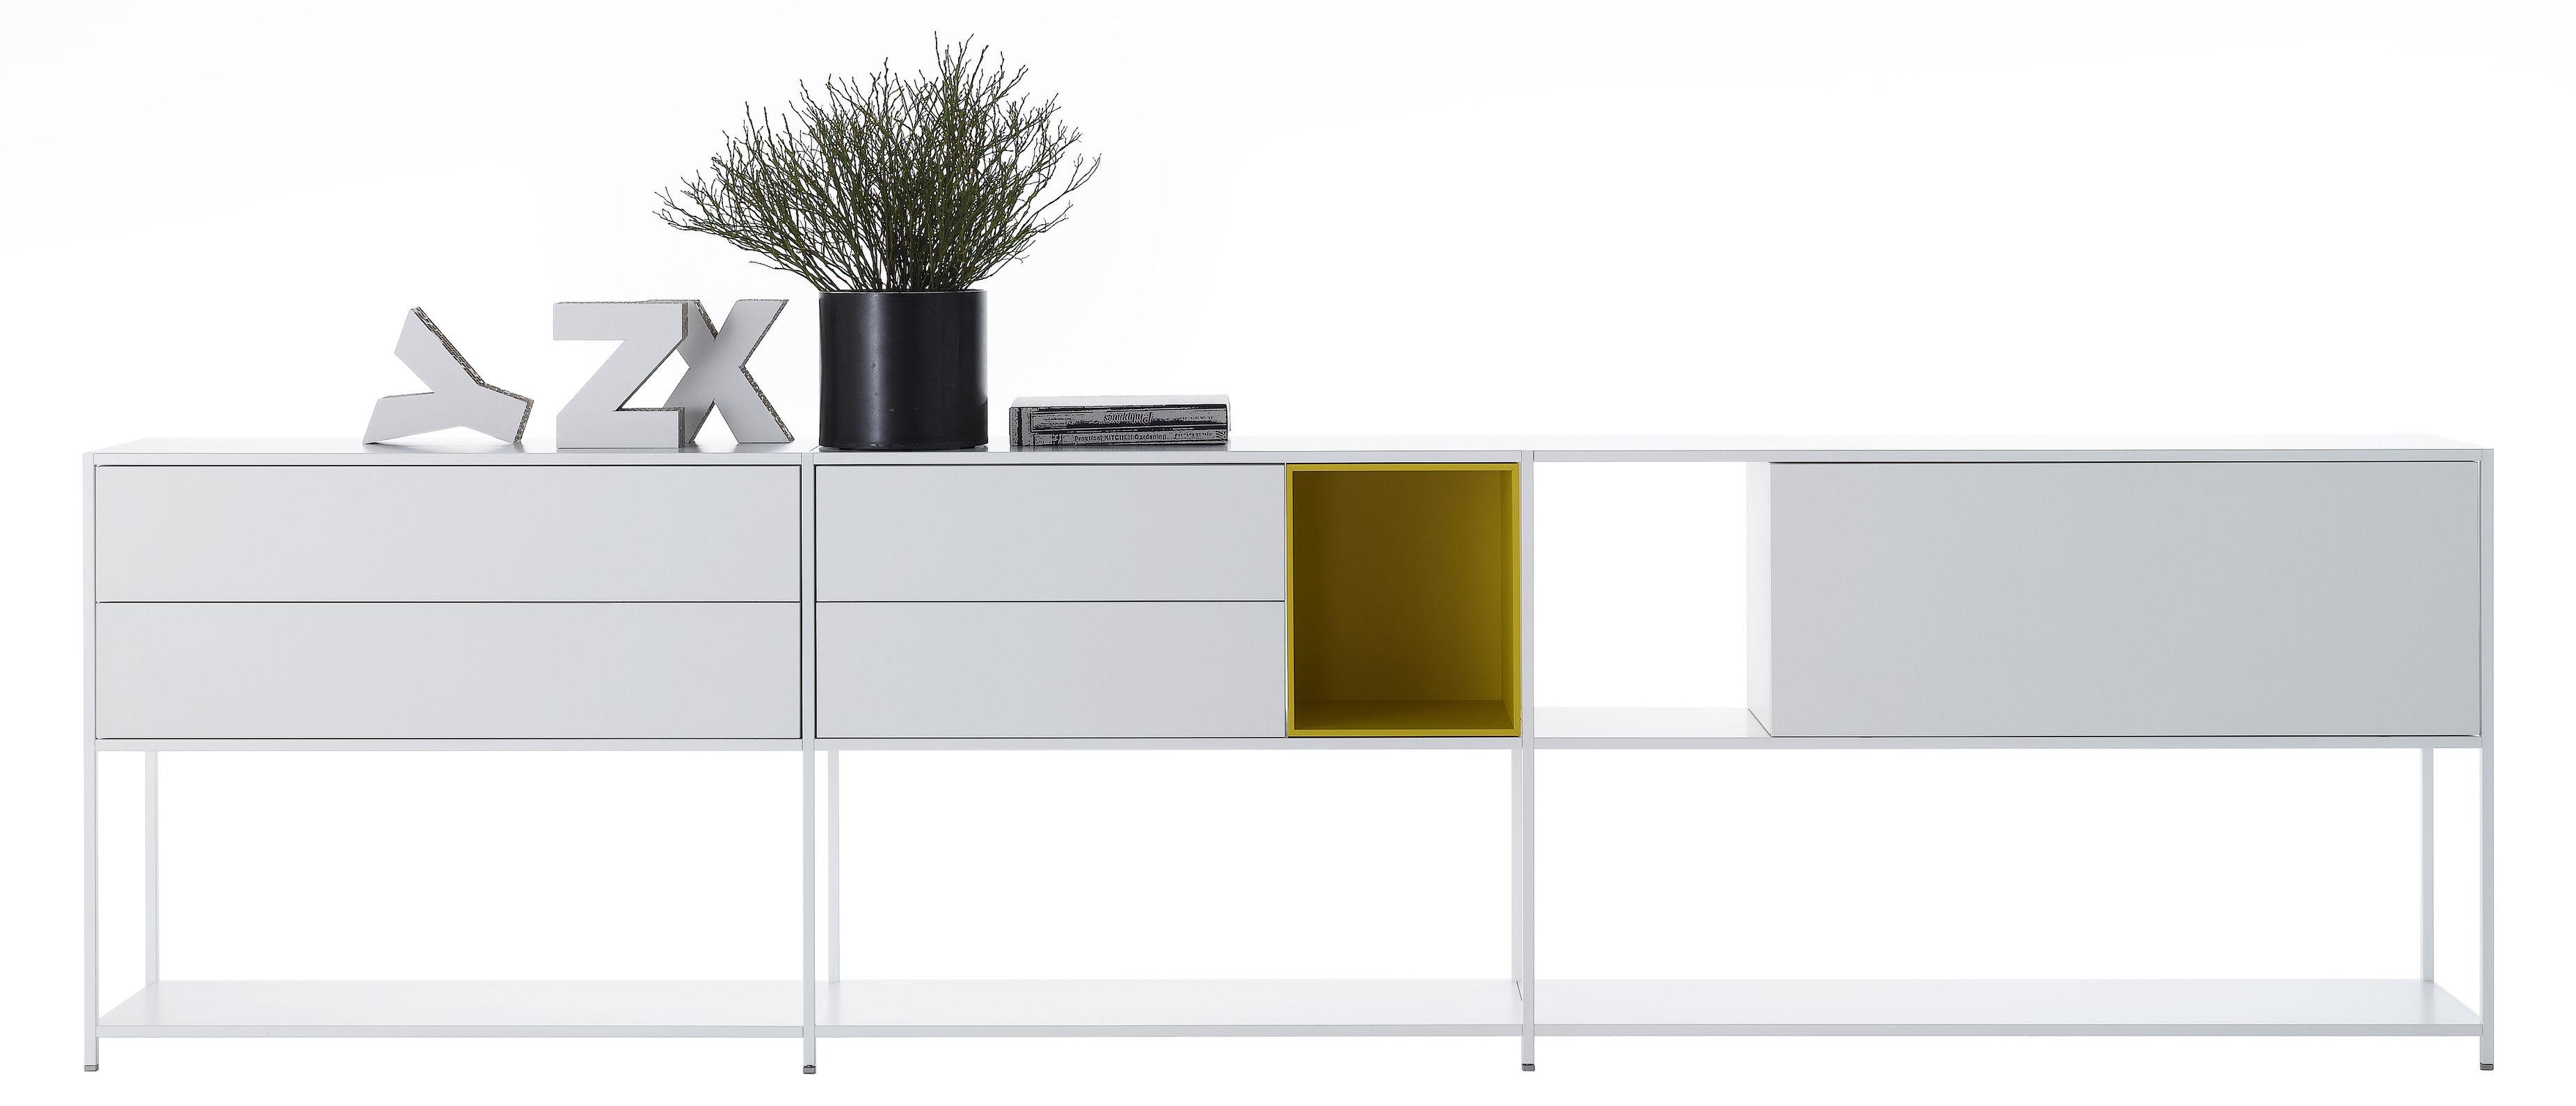 Furniture - Bookcases & Bookshelves - Minima 3.0 Shelf - / W 300 x H 79 cm - Integrated boxes by MDF Italia - White / Yellow - Aluminium, Wood fibre